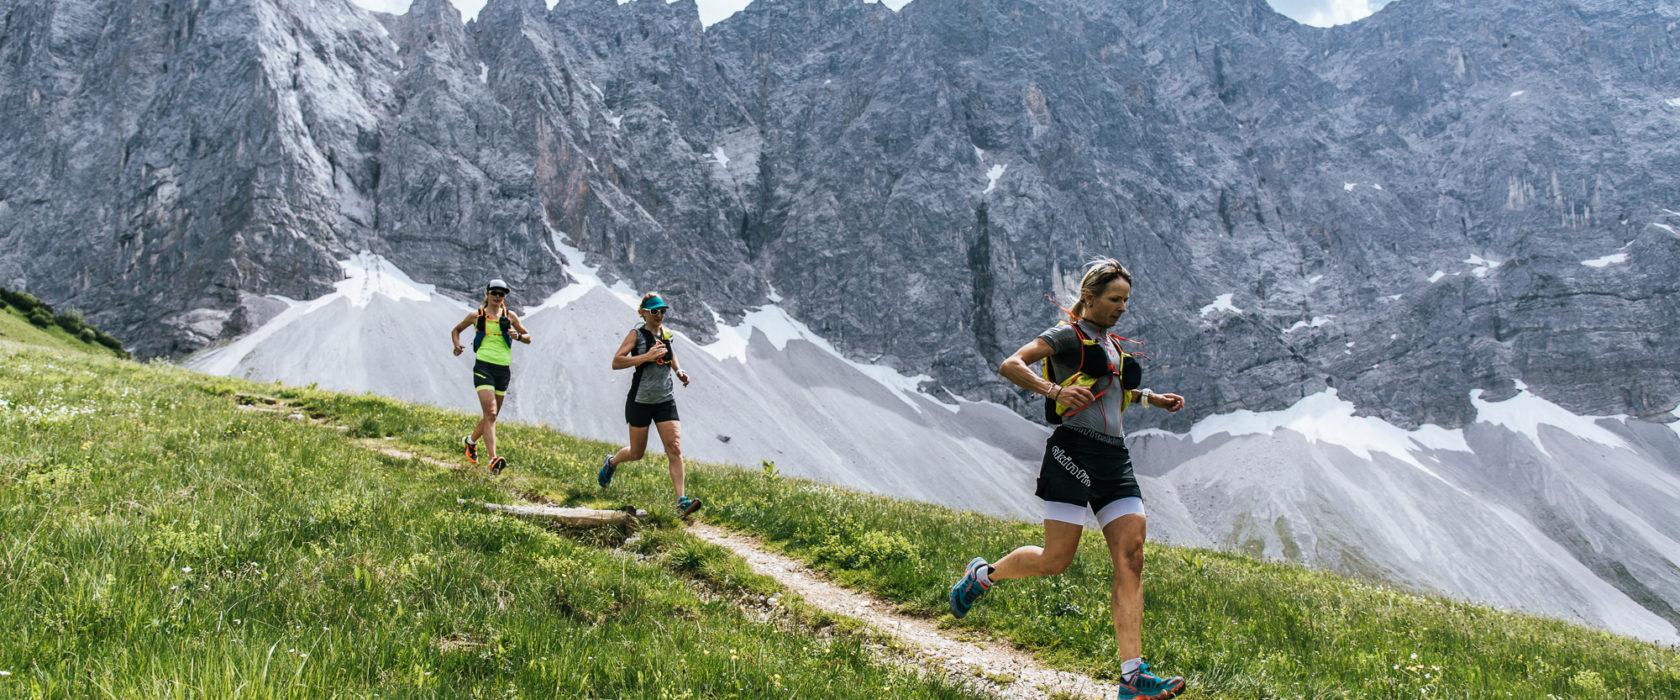 trailrunning camp karwendel